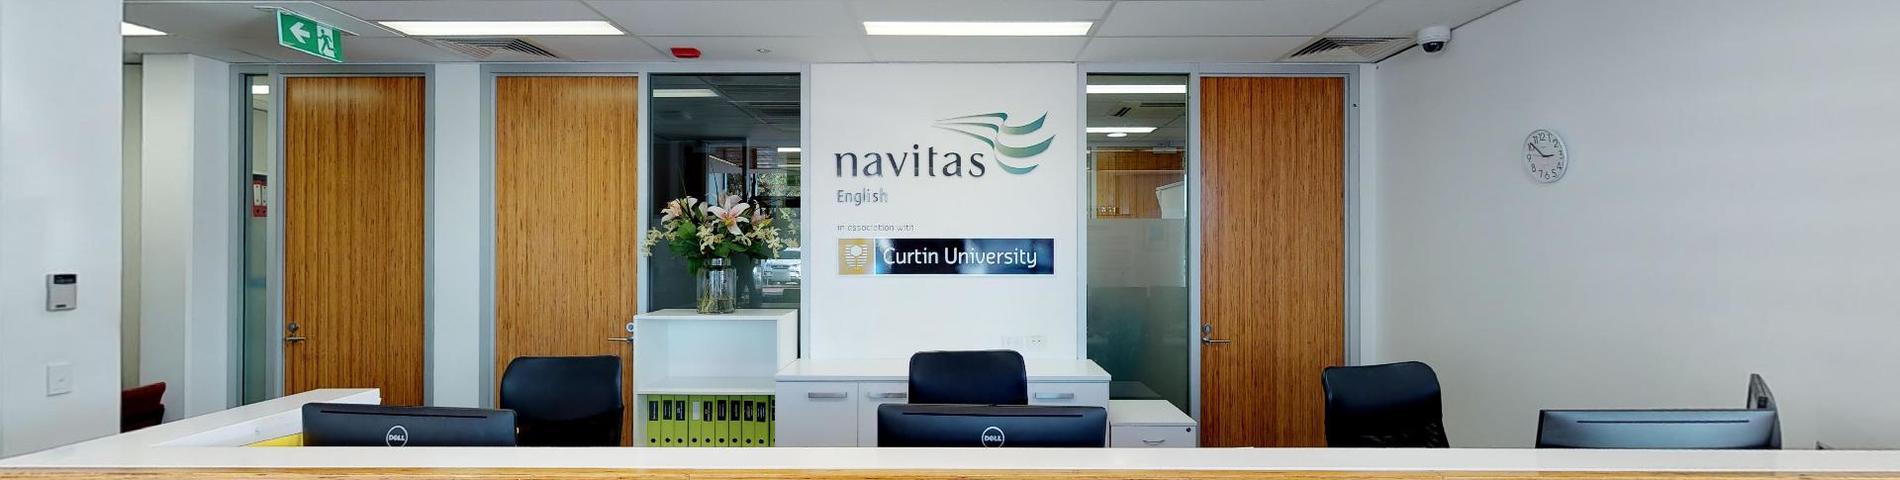 Navitas English photo 1